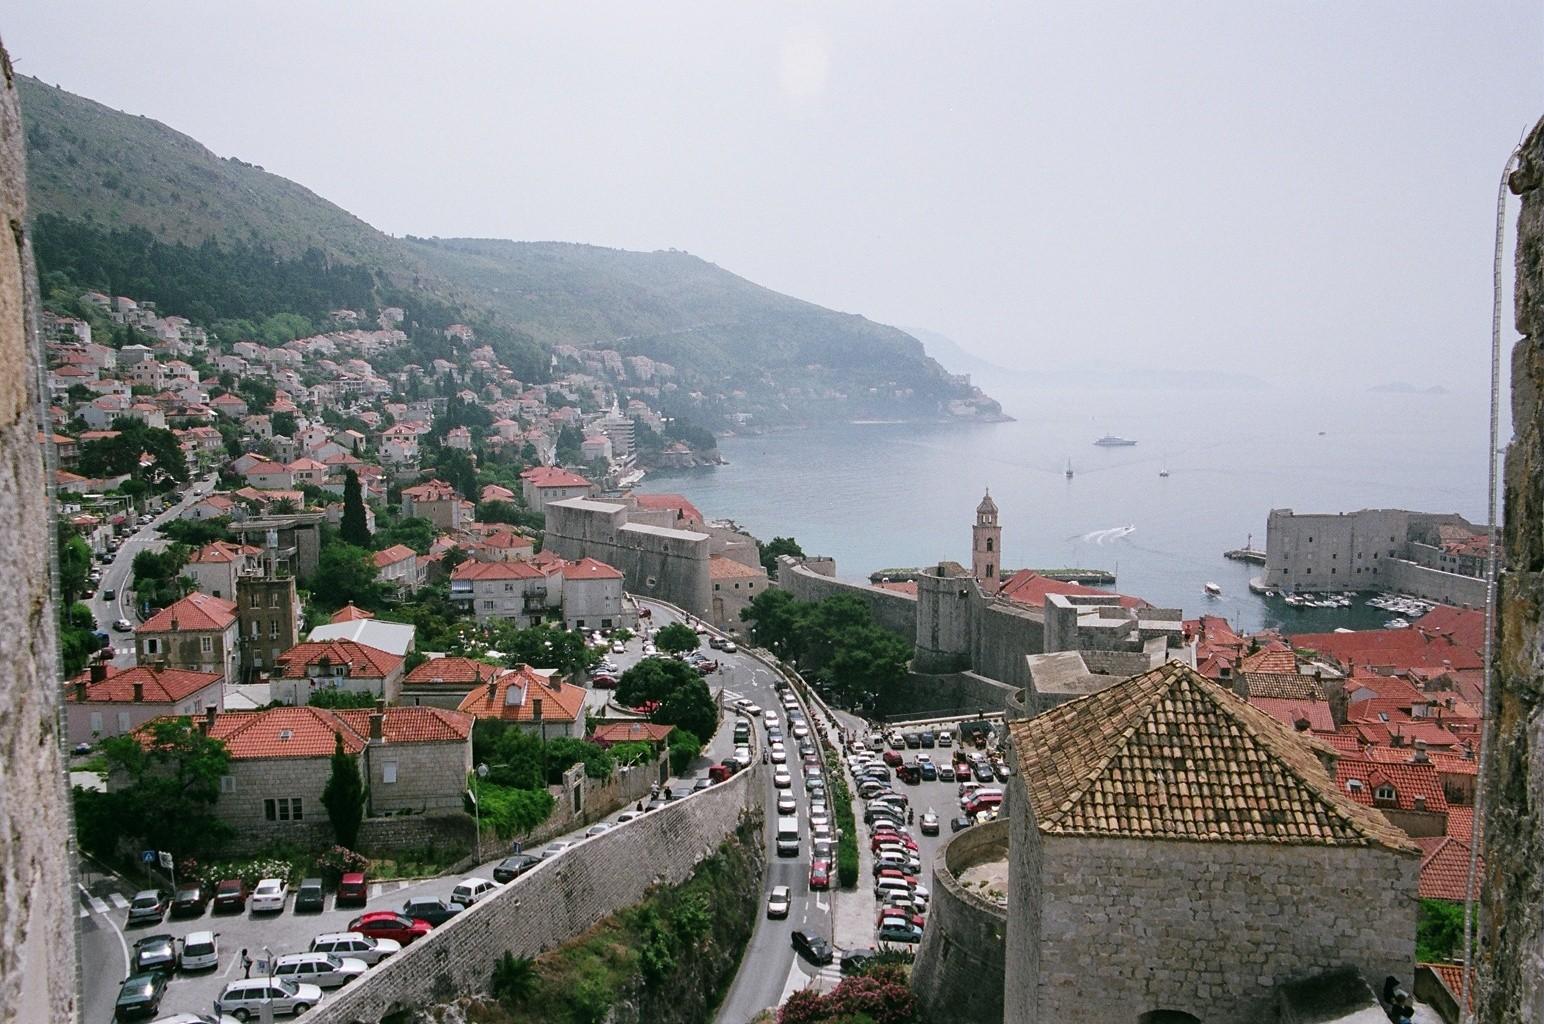 Dubrovnik Croatia  city photos gallery : Bestand:Dubrovnik, Croatia 2006 Wikipedia